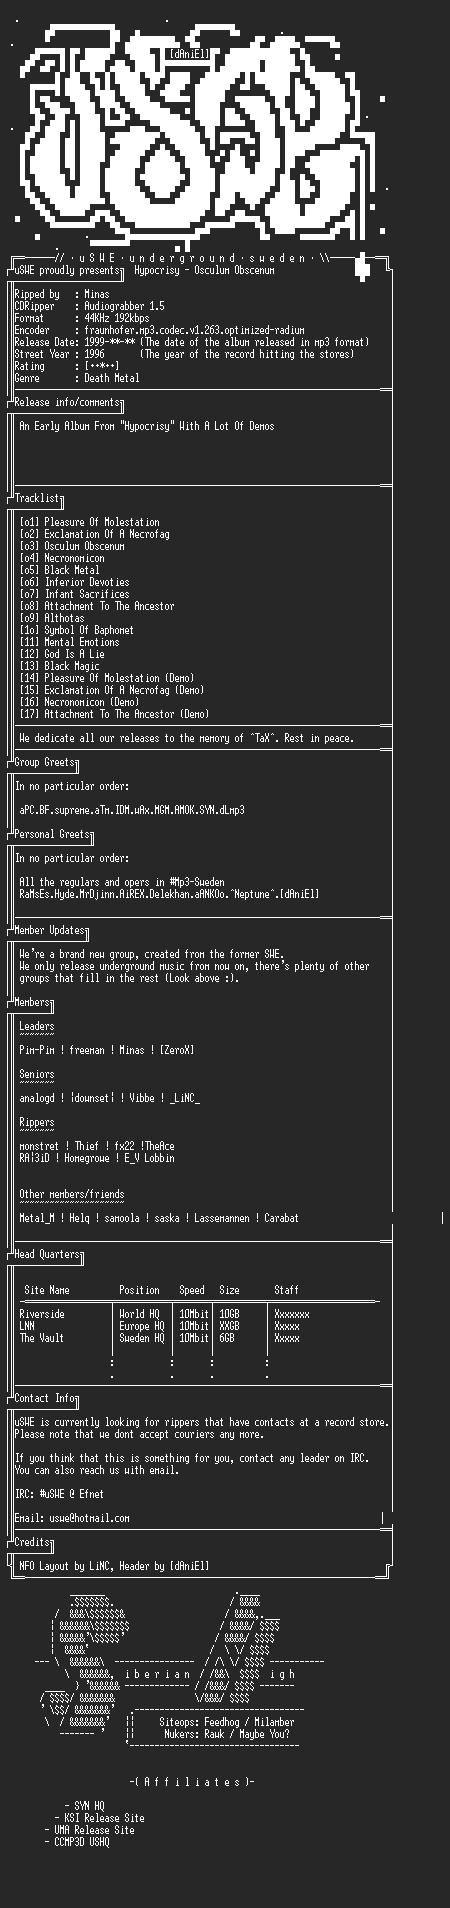 NFO file for Hypocrisy_-_Osculum_Obscenum_(Digipack)_(1993)_-_uSWE